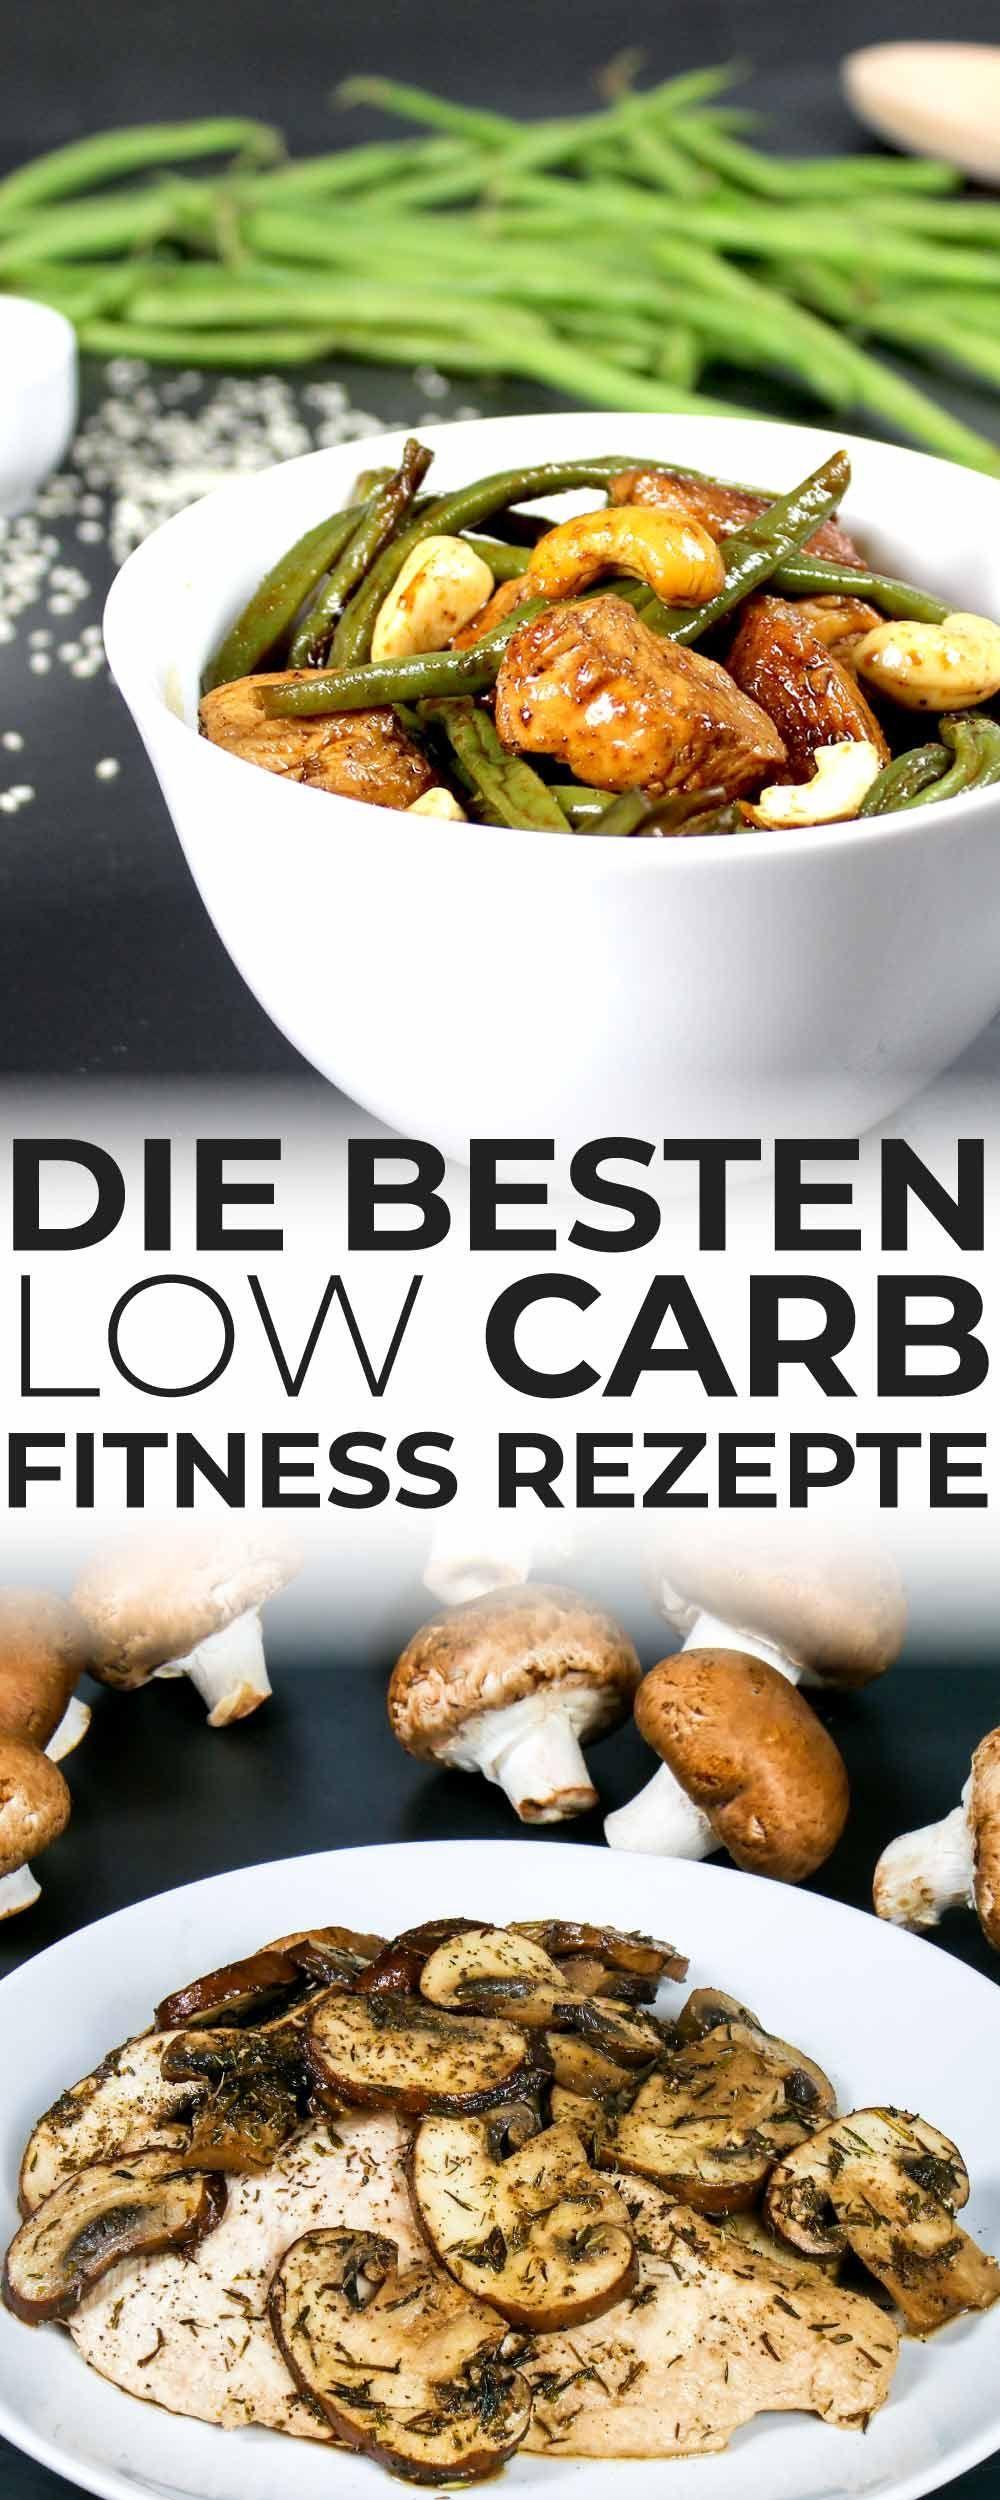 14 gesunde Fitness-Rezepte zum Abnehmen (+3 Bonus-Tipps) Die besten Low Carb Fitness Rezepte  #gesun...